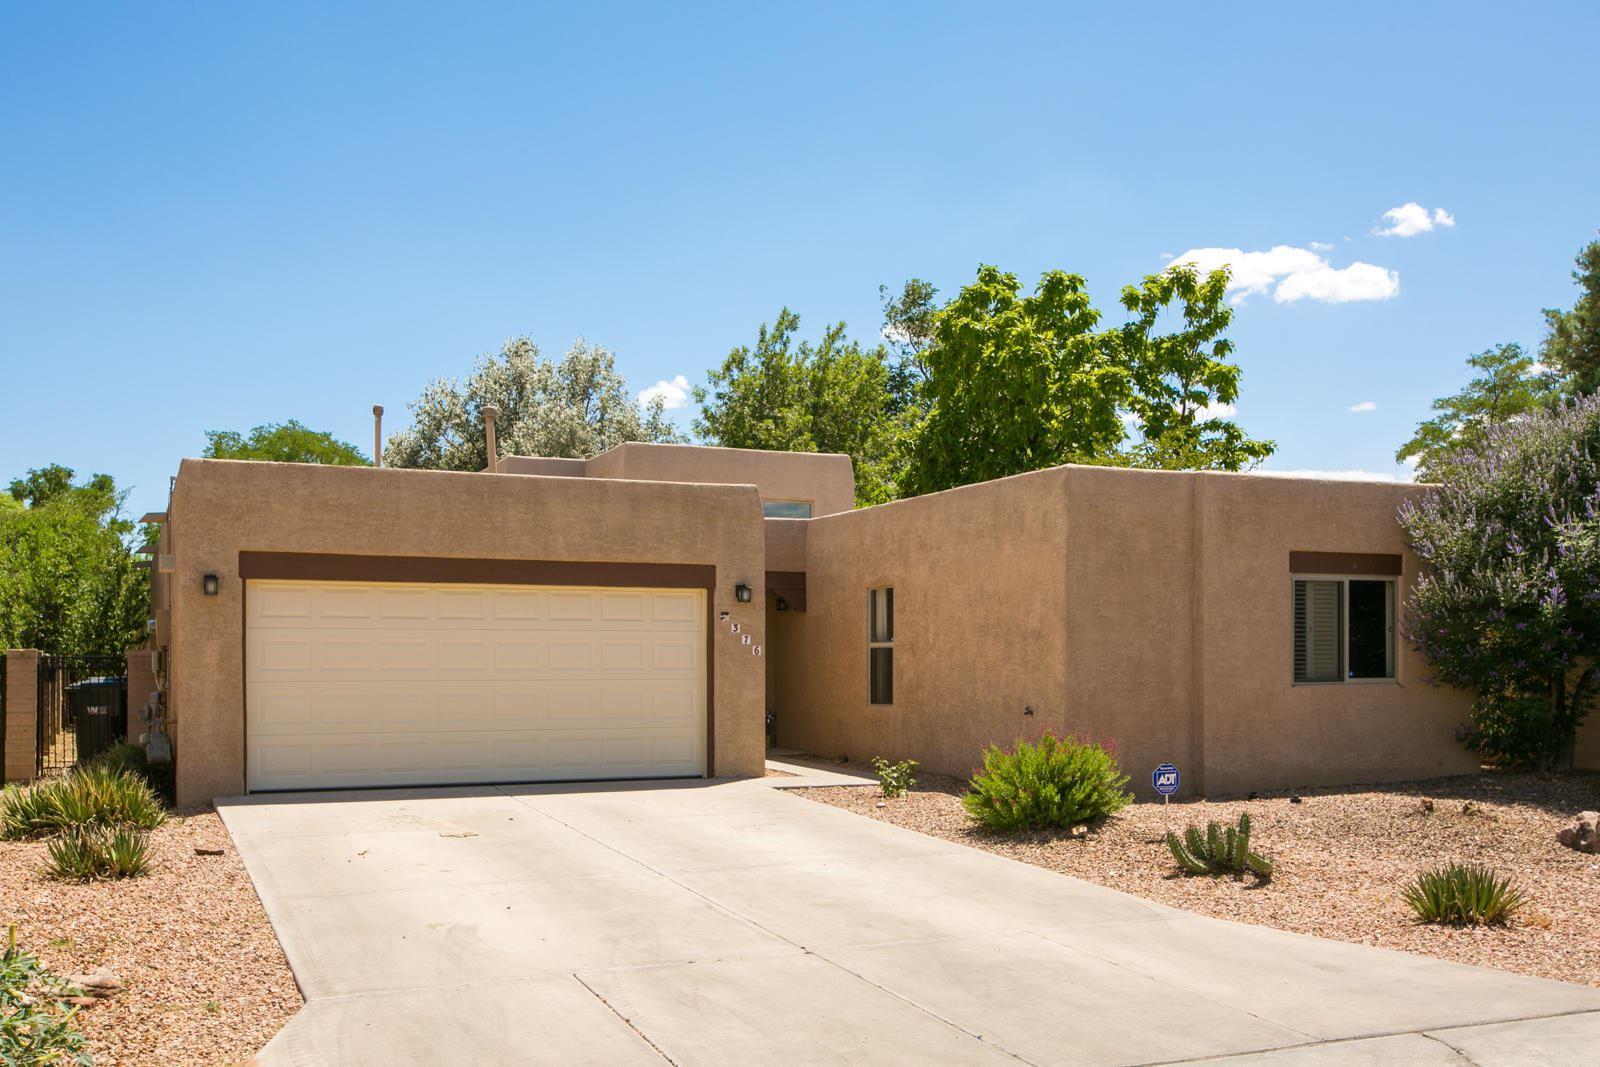 Photo of 376 La Chamisal Lane NW, Los Ranchos, NM 87107 (MLS # 971823)